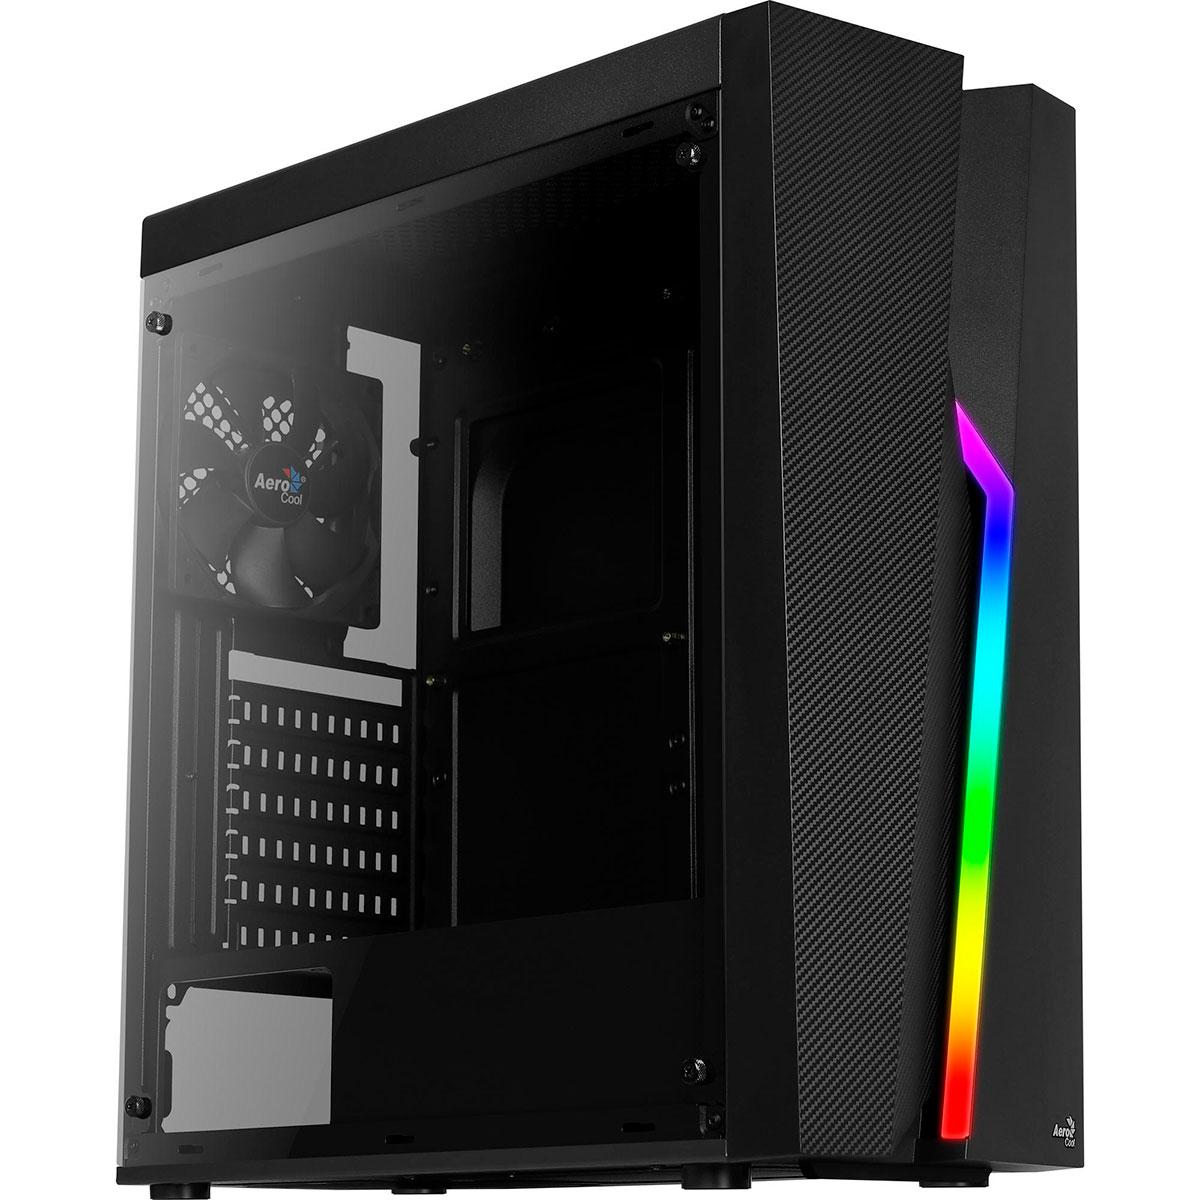 Gabinete Gamer Aerocool RGB Bolt Acrílico, ATX, Com FAN, Lateral em Acrílico,  Preto